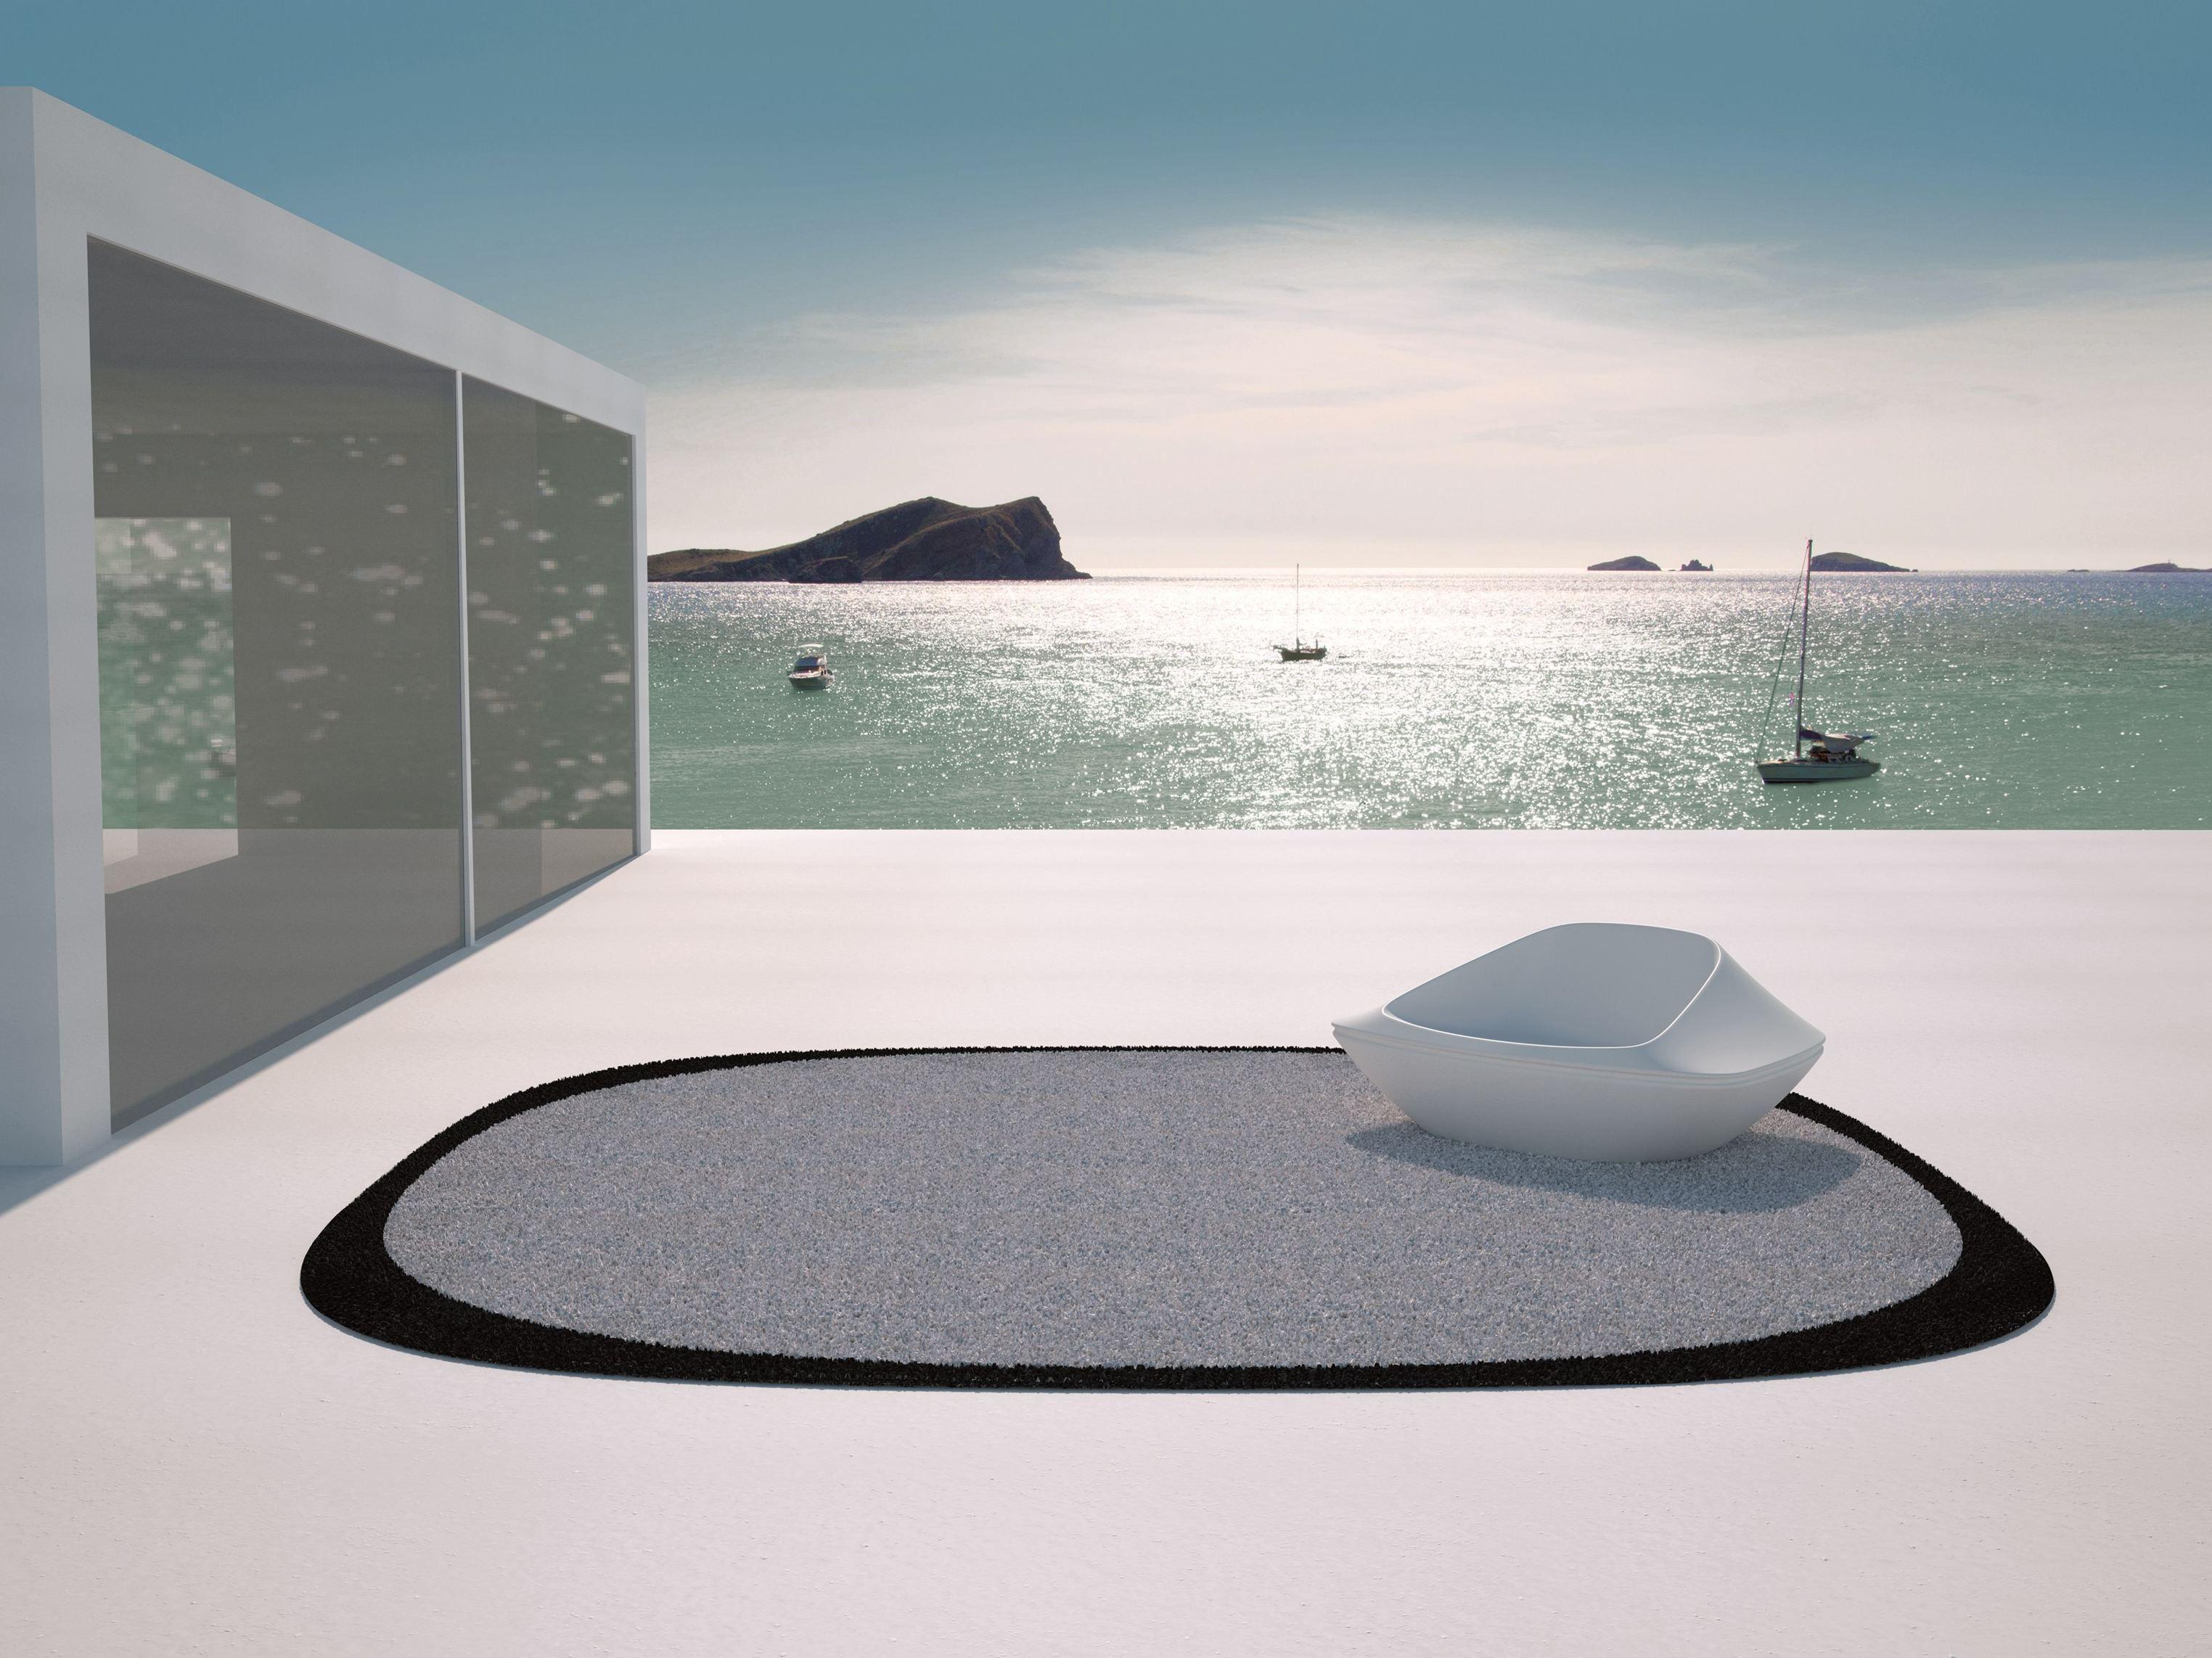 ufo outdoor rug by vondom design ora to. Black Bedroom Furniture Sets. Home Design Ideas